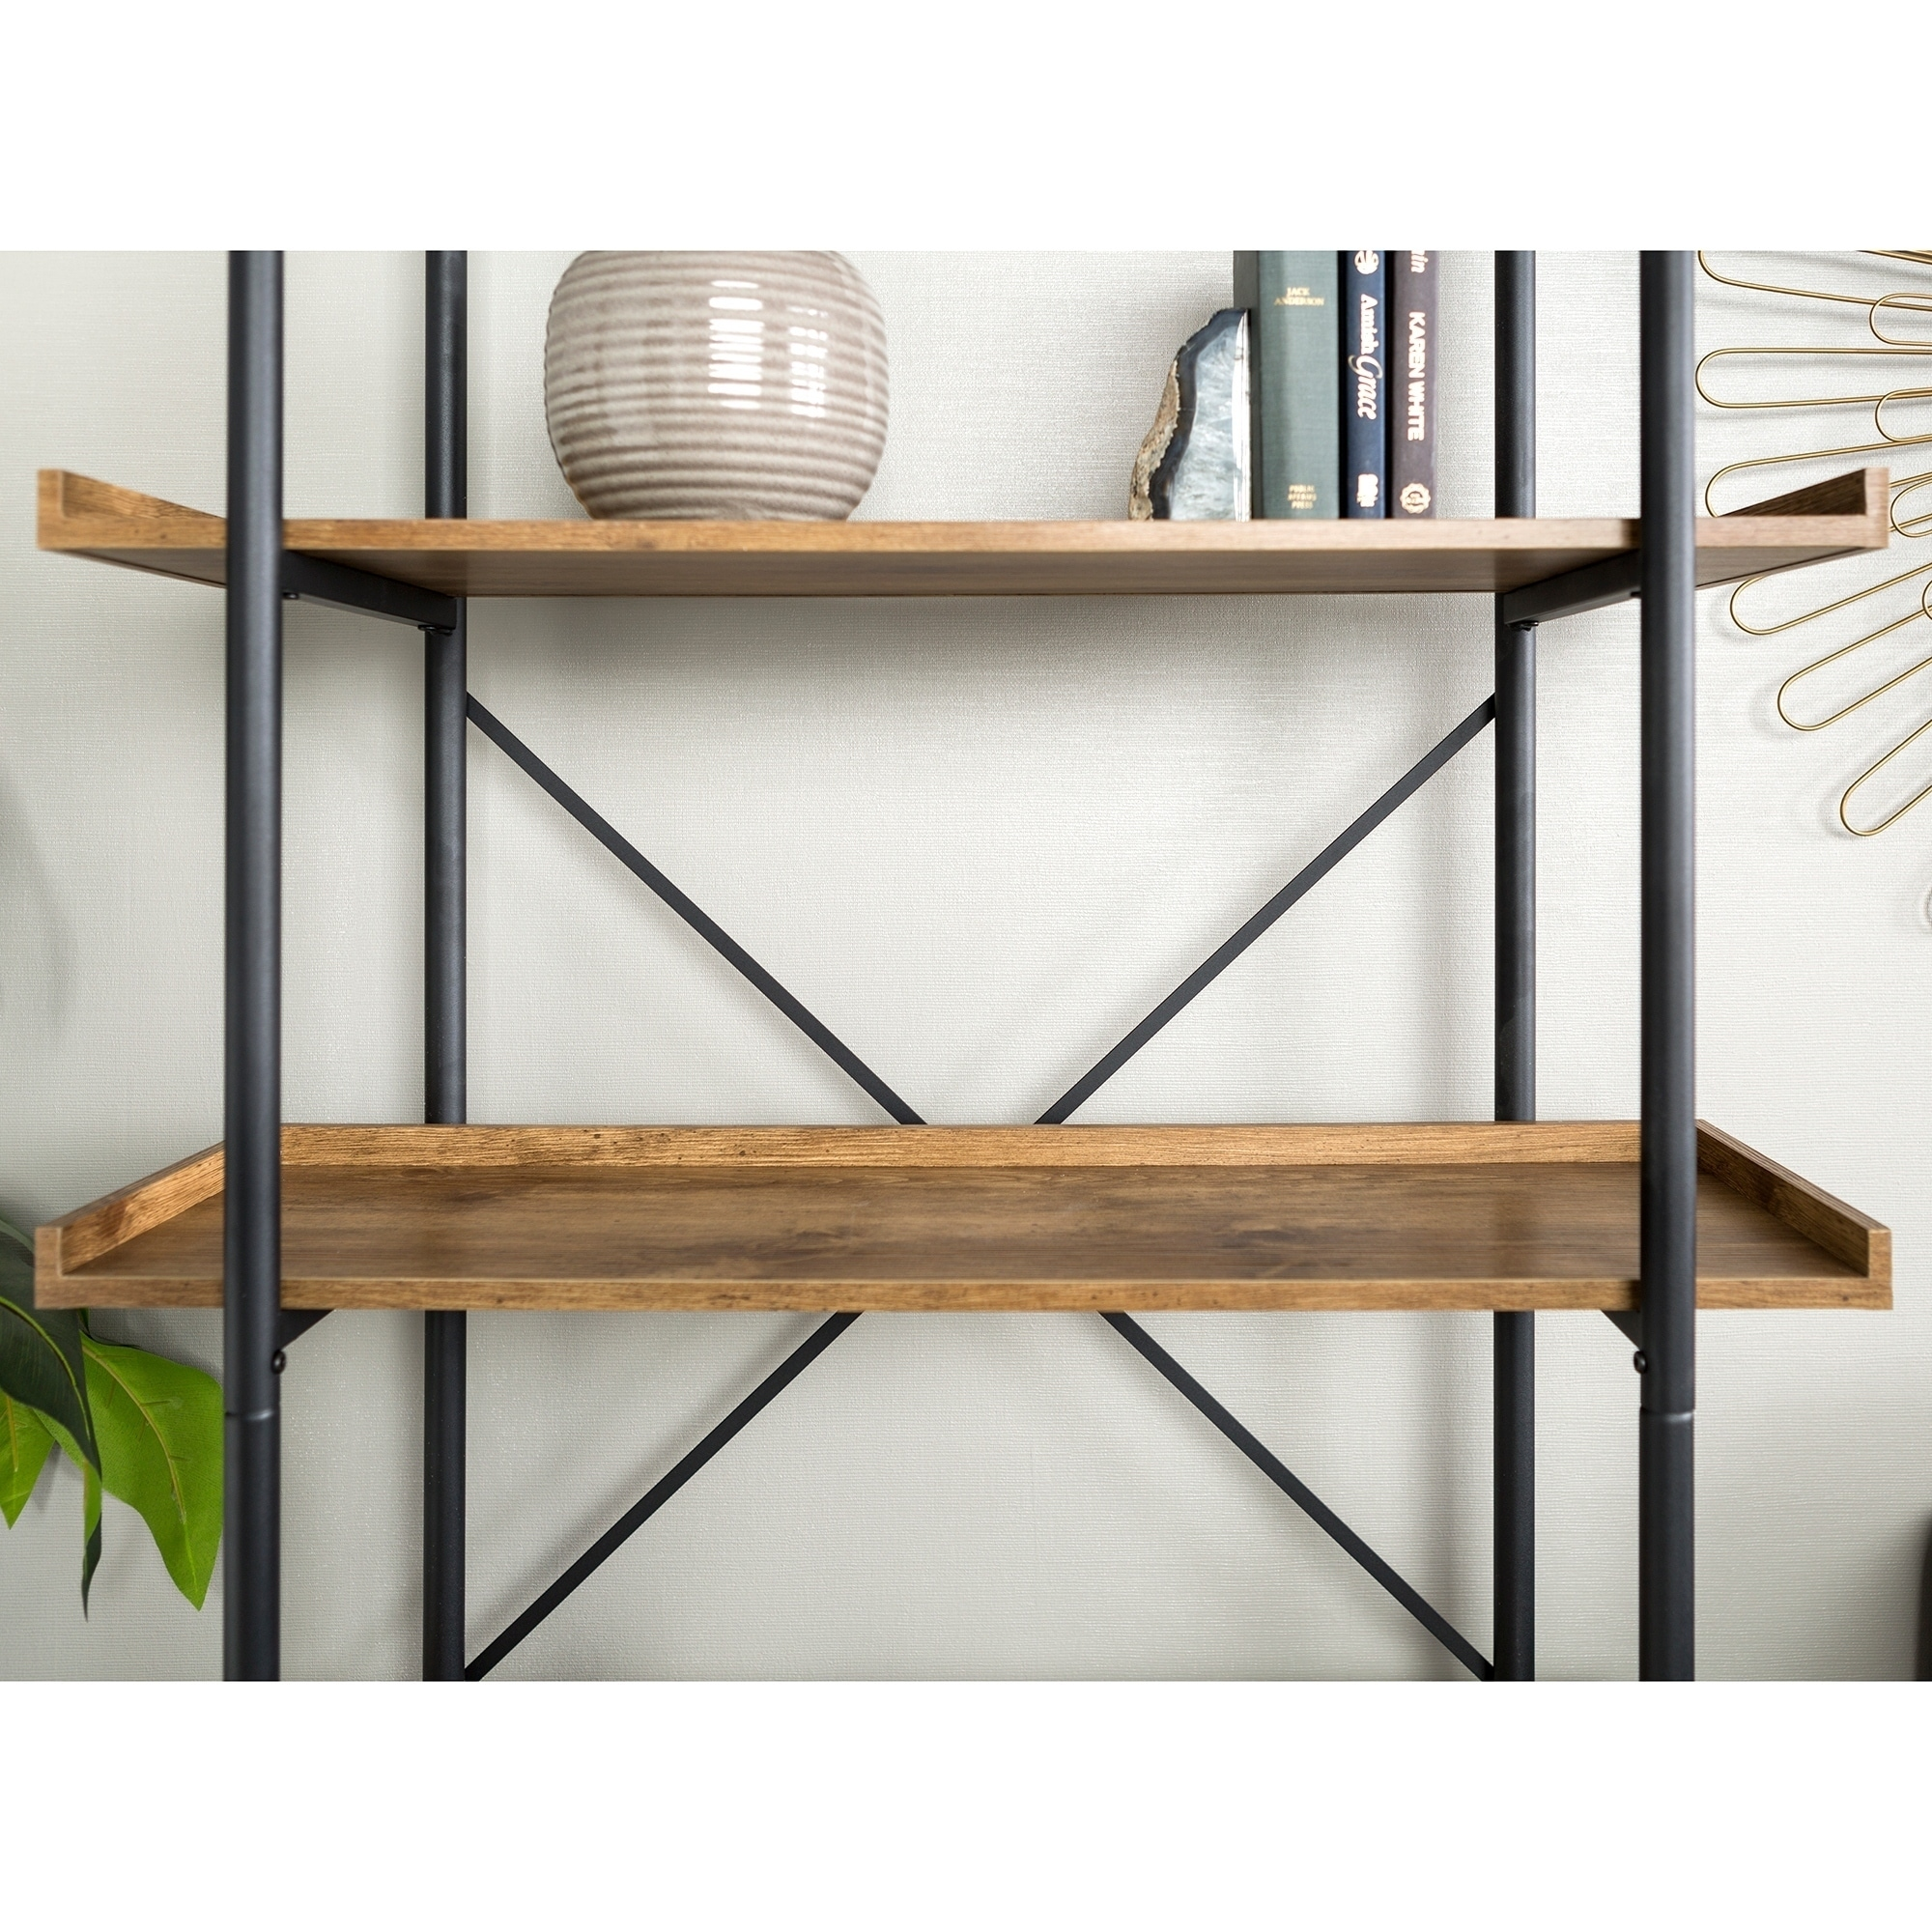 Shop Carbon Loft Edelman 68 Inch Urban Pipe Bookshelf